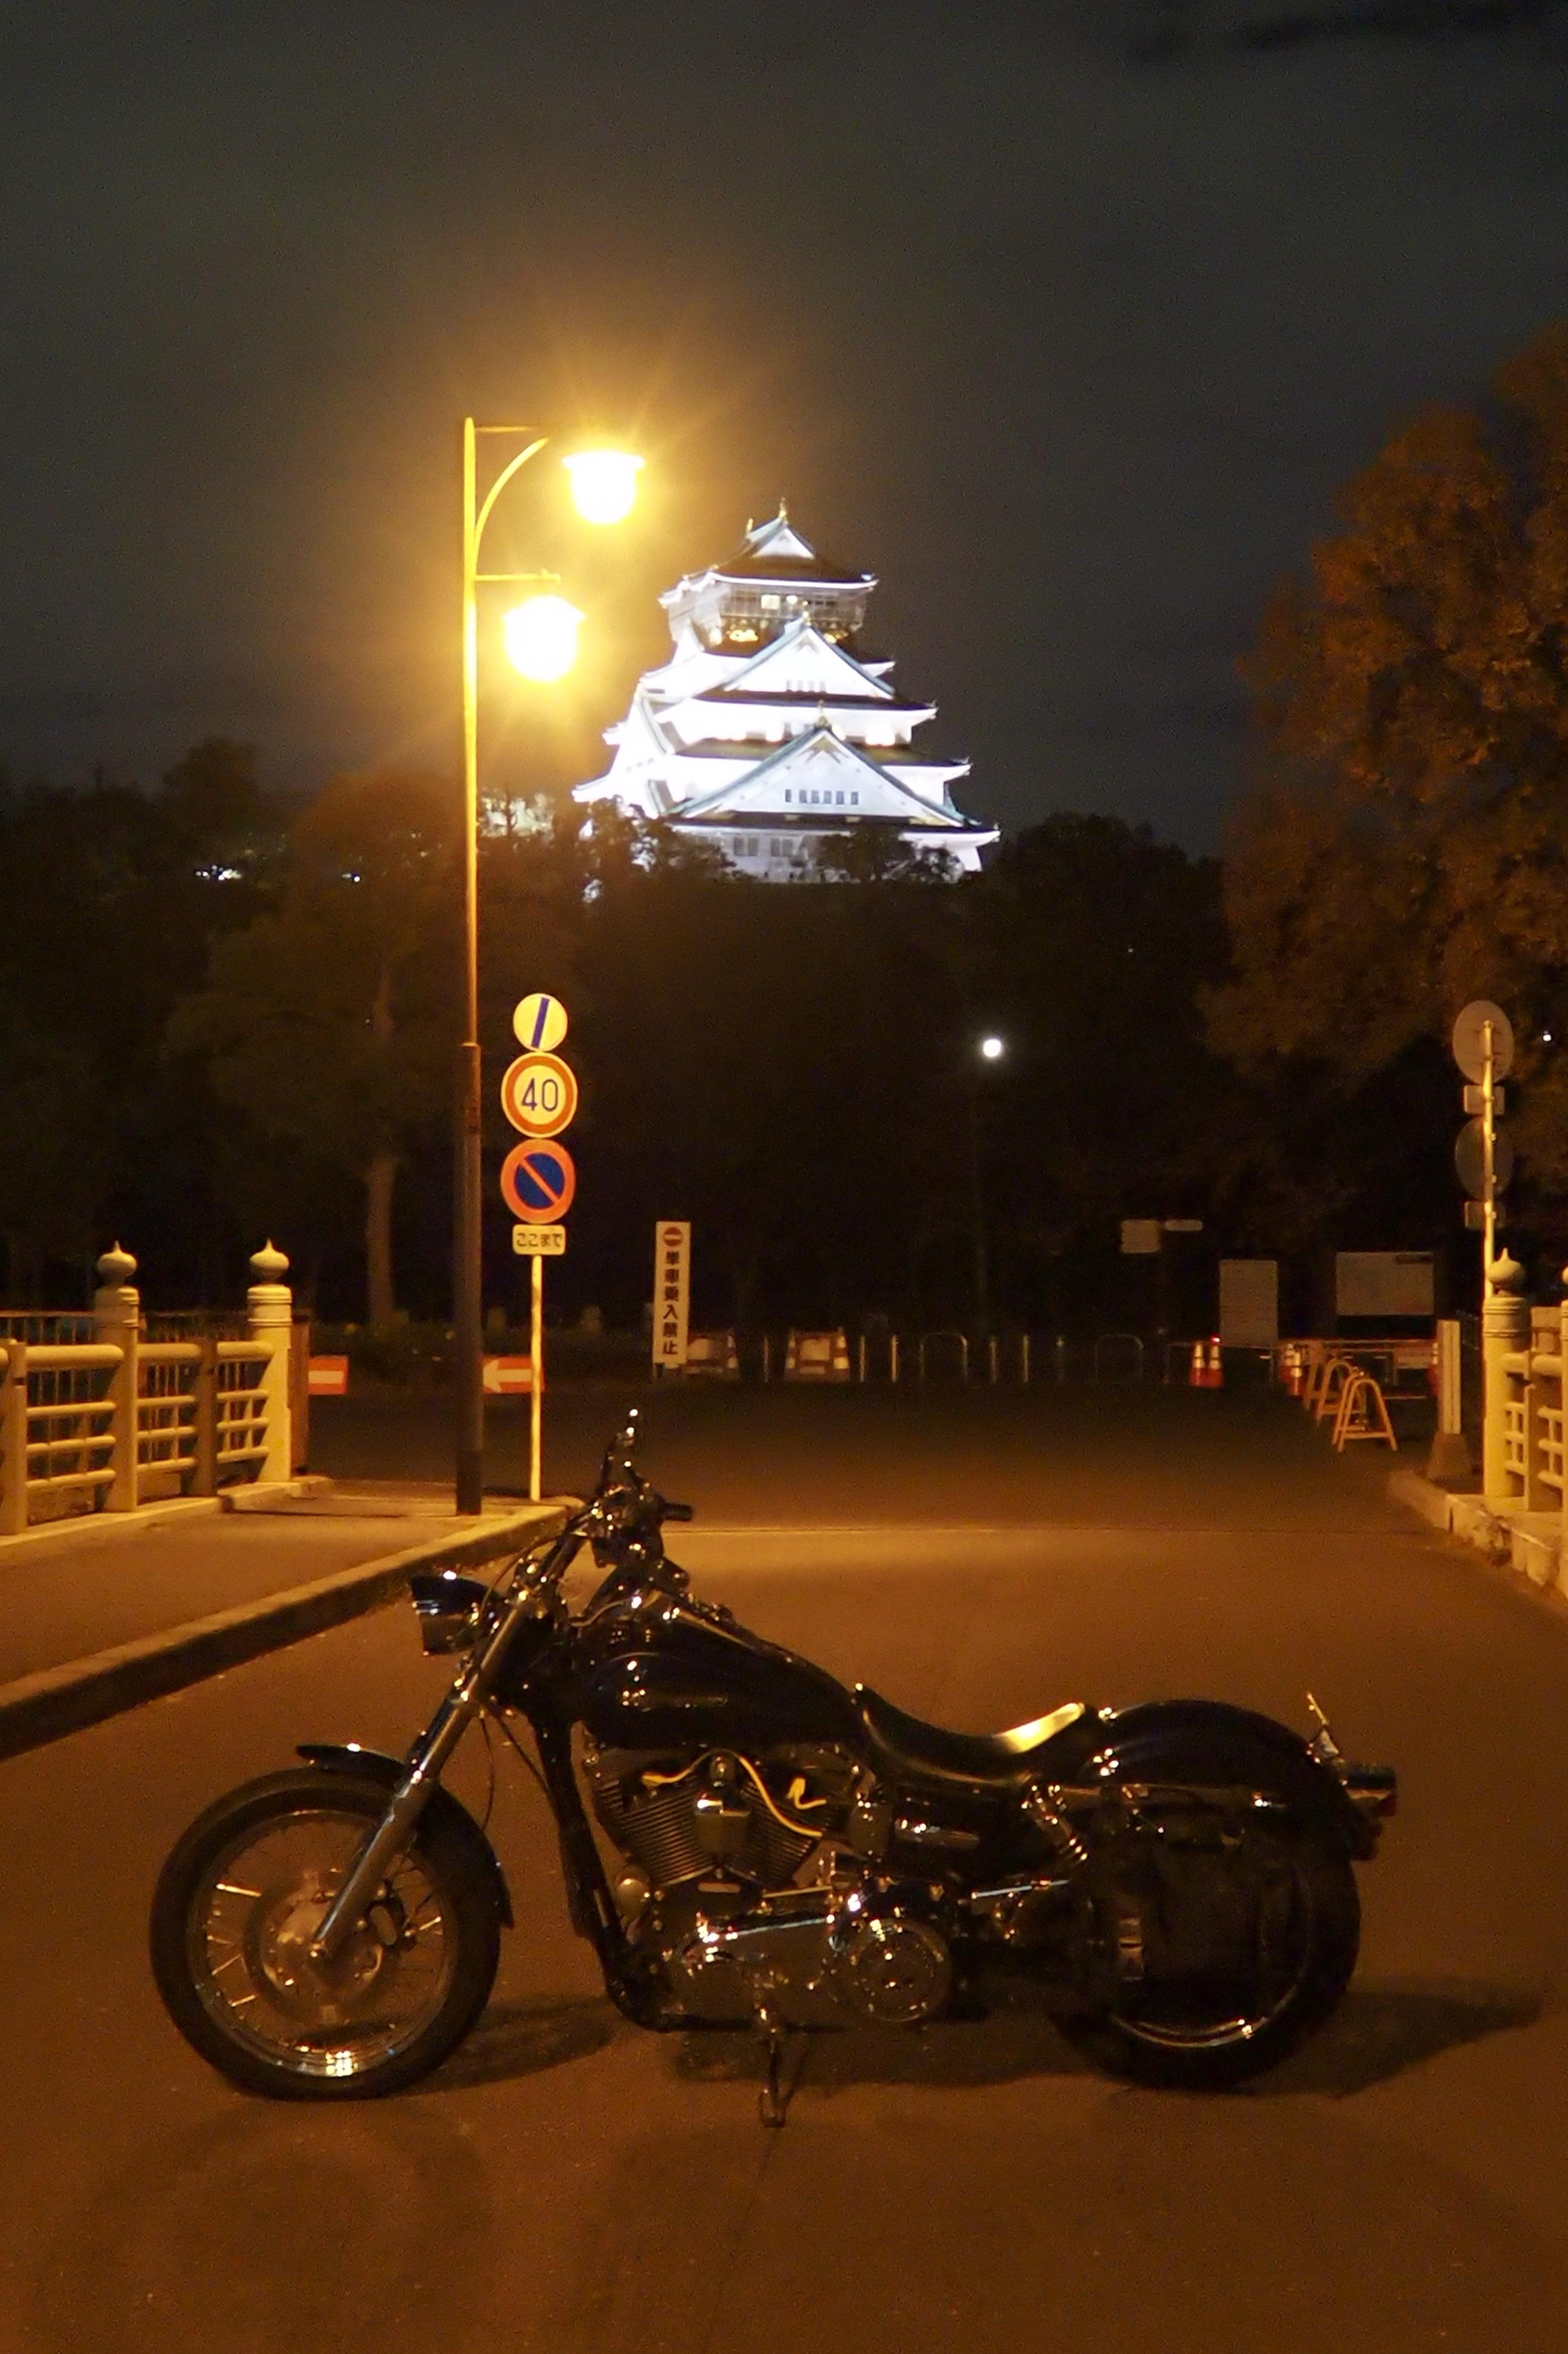 harleydavidson-motorcycle-touring-blog-osaka-nightouringt-2.jpg